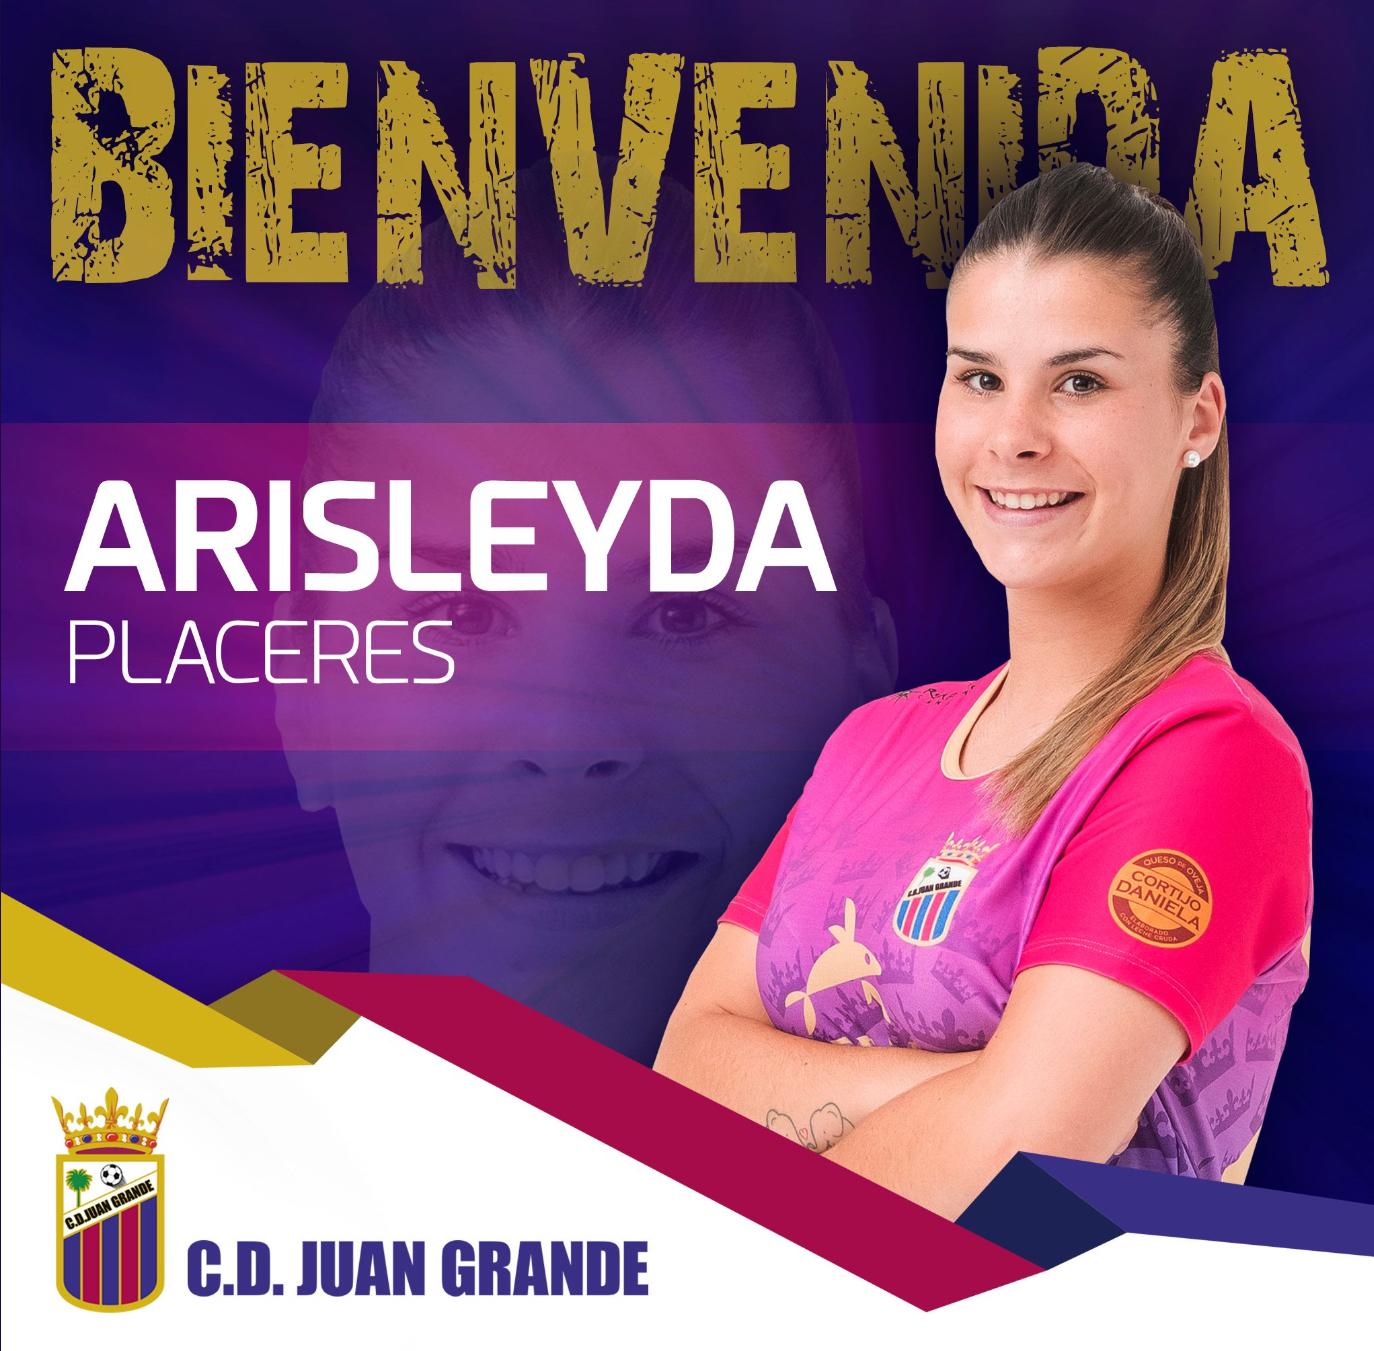 Arisleyda Placeres